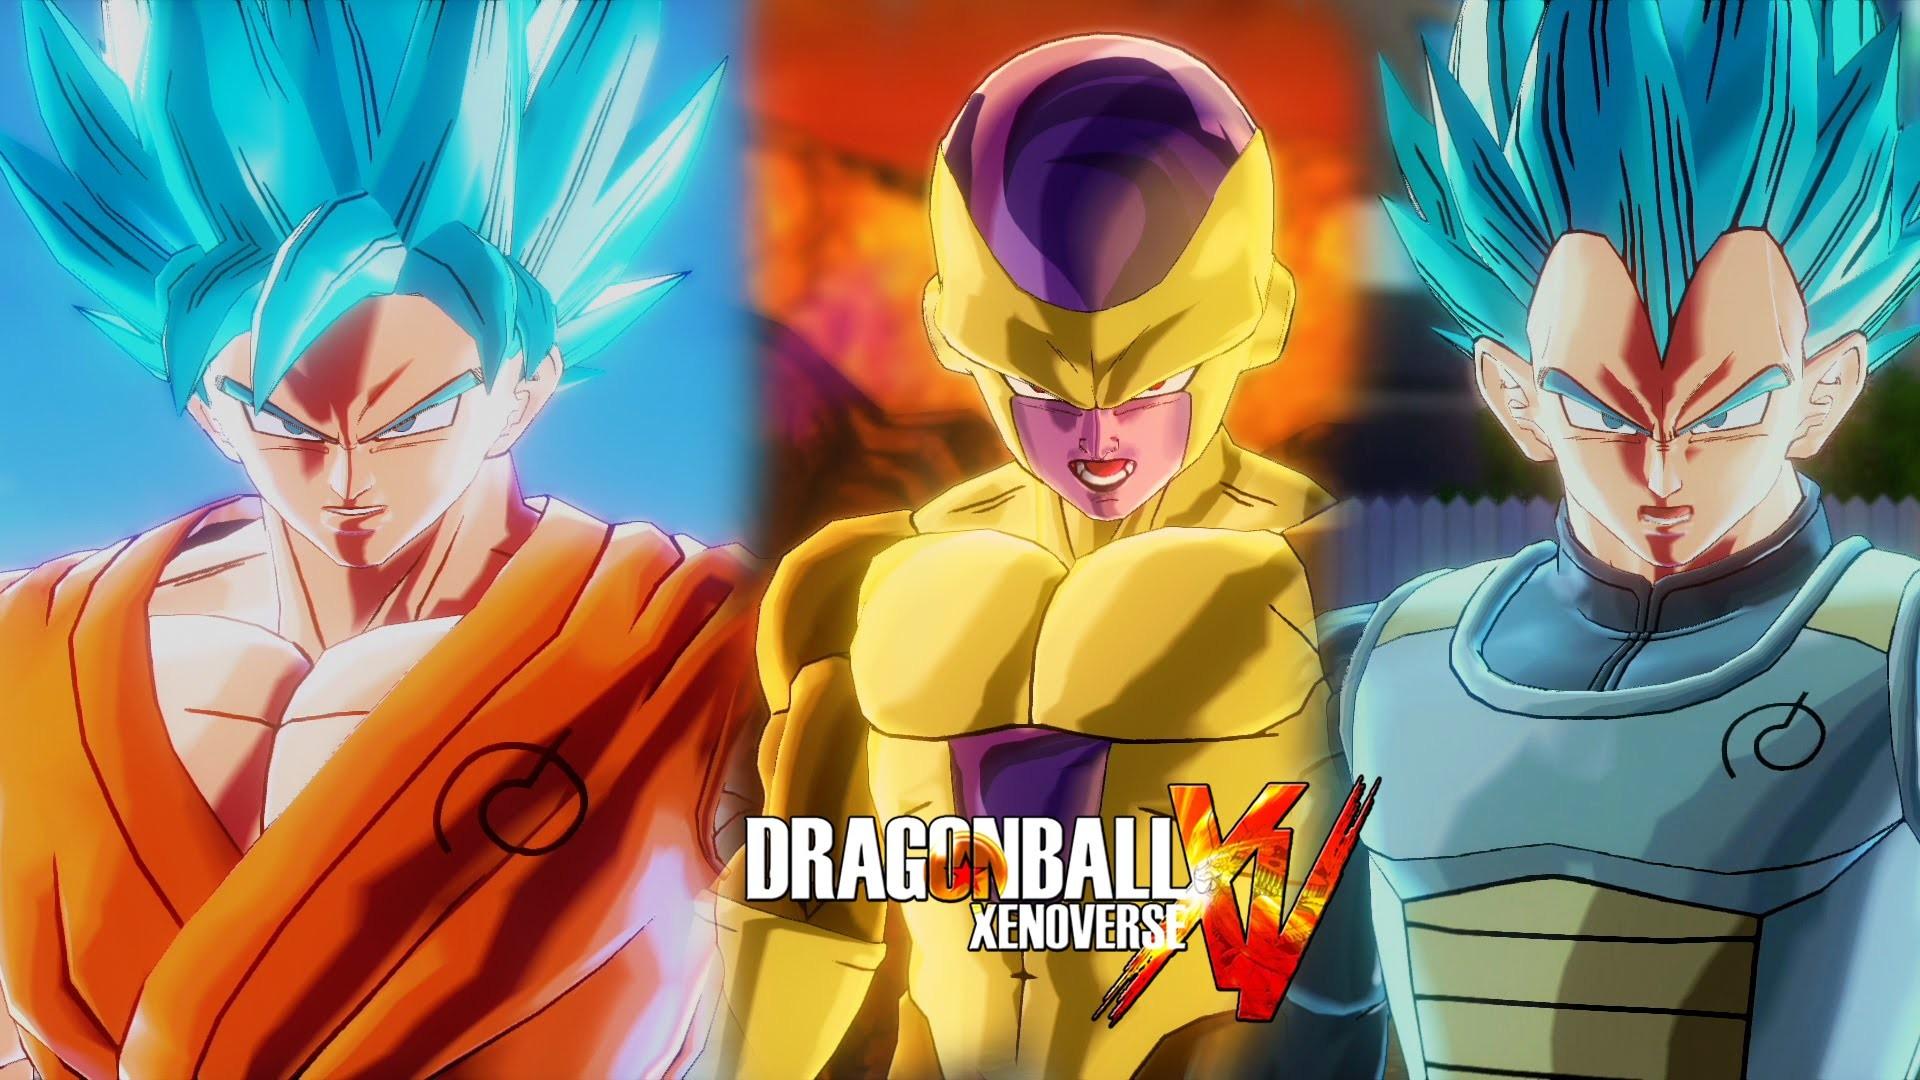 Dragon Ball Xenoverse (PS4) : SSGSS Goku & SSGSS Vegeta Vs Golden Frieza &  Beerus 【60FPS 1080P】 – YouTube